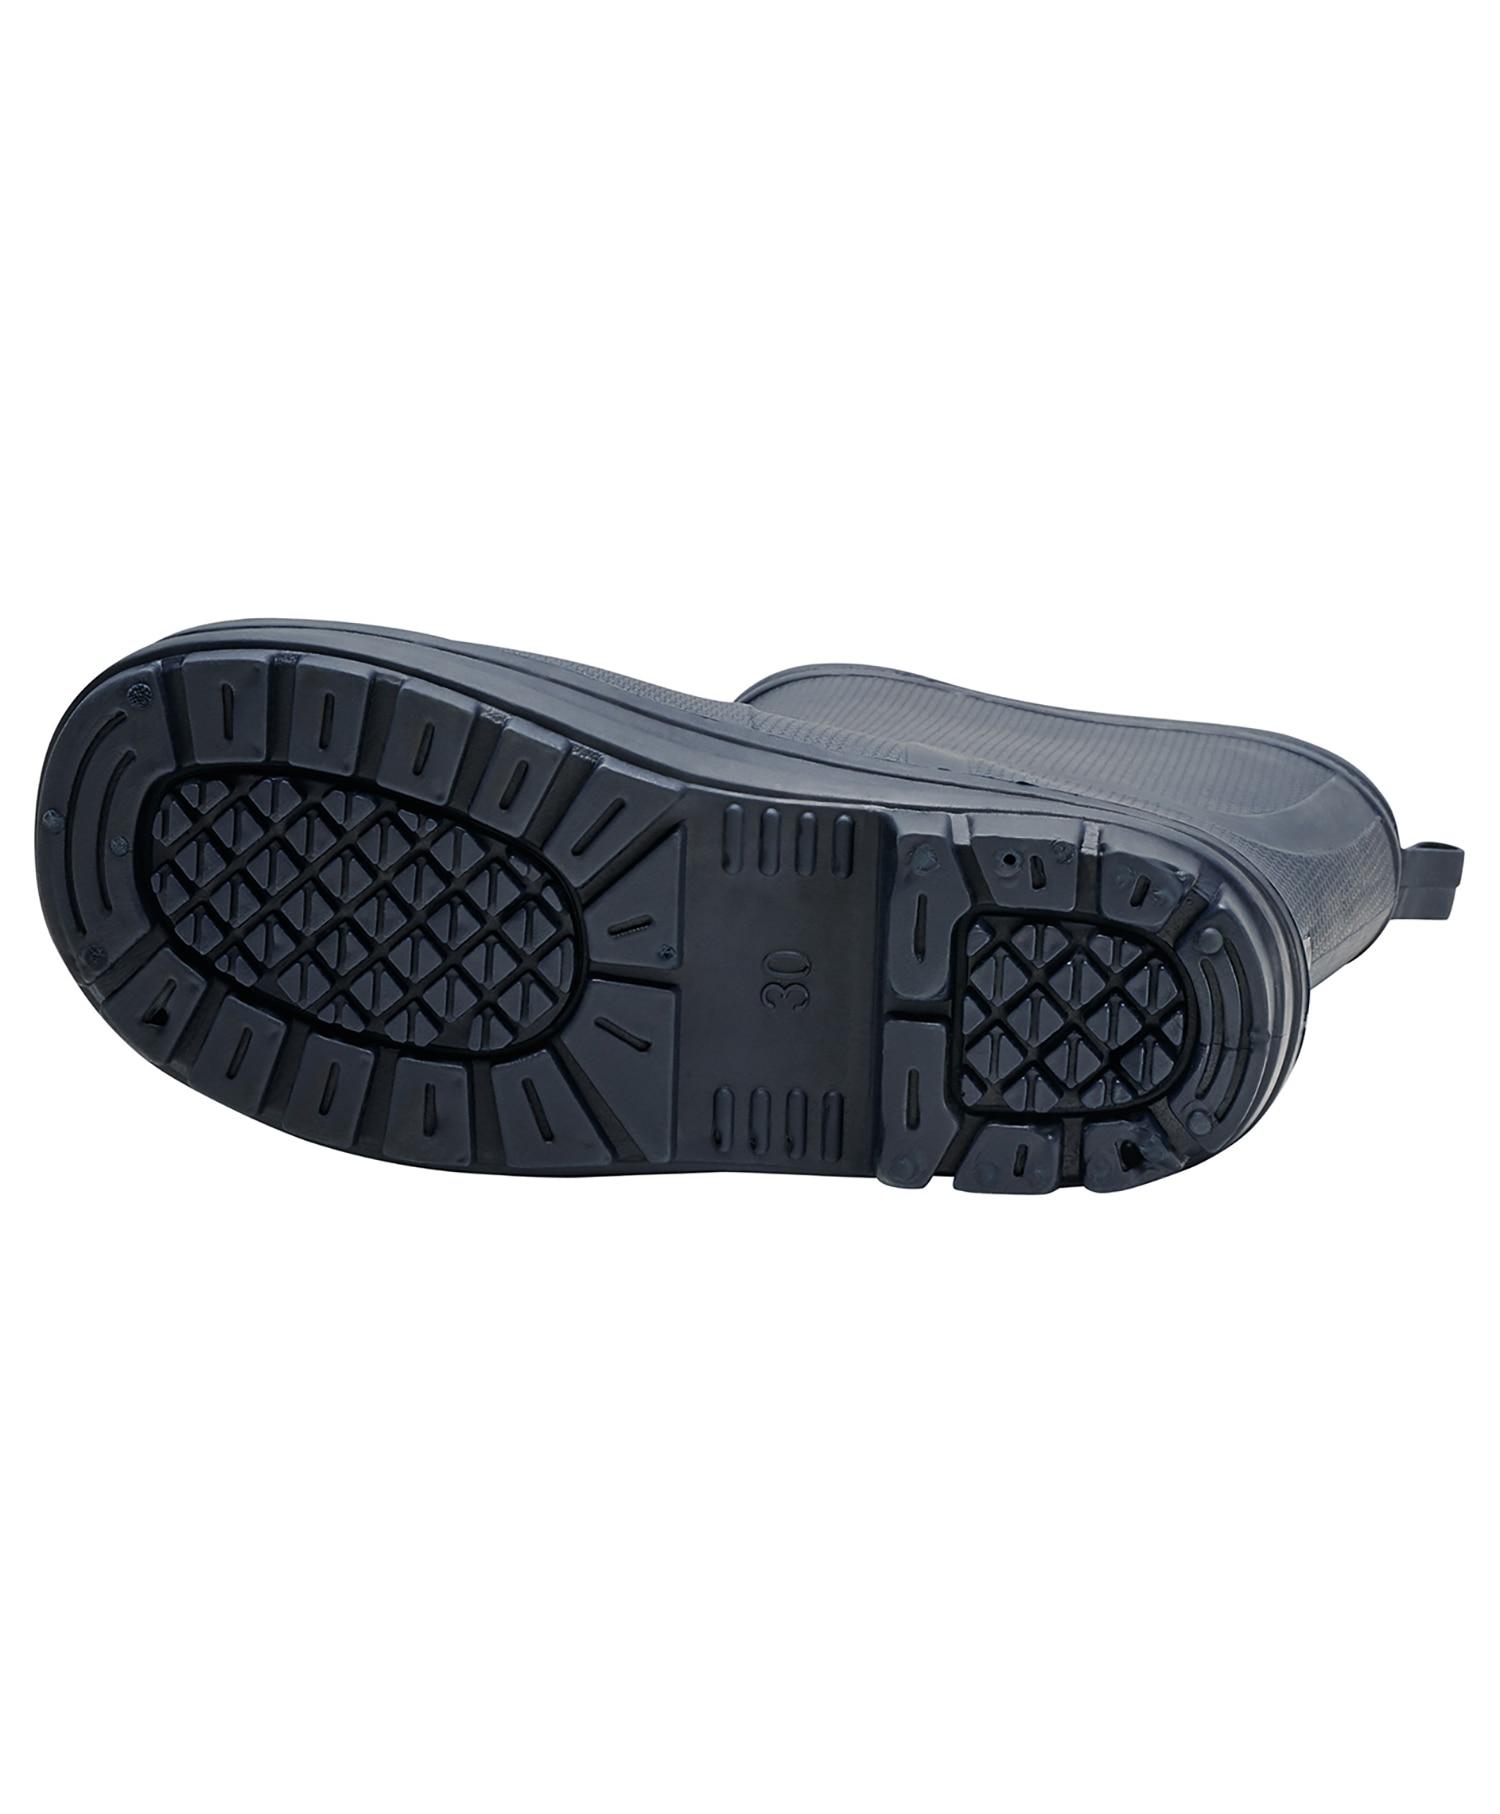 Hummel Thermo boot jr